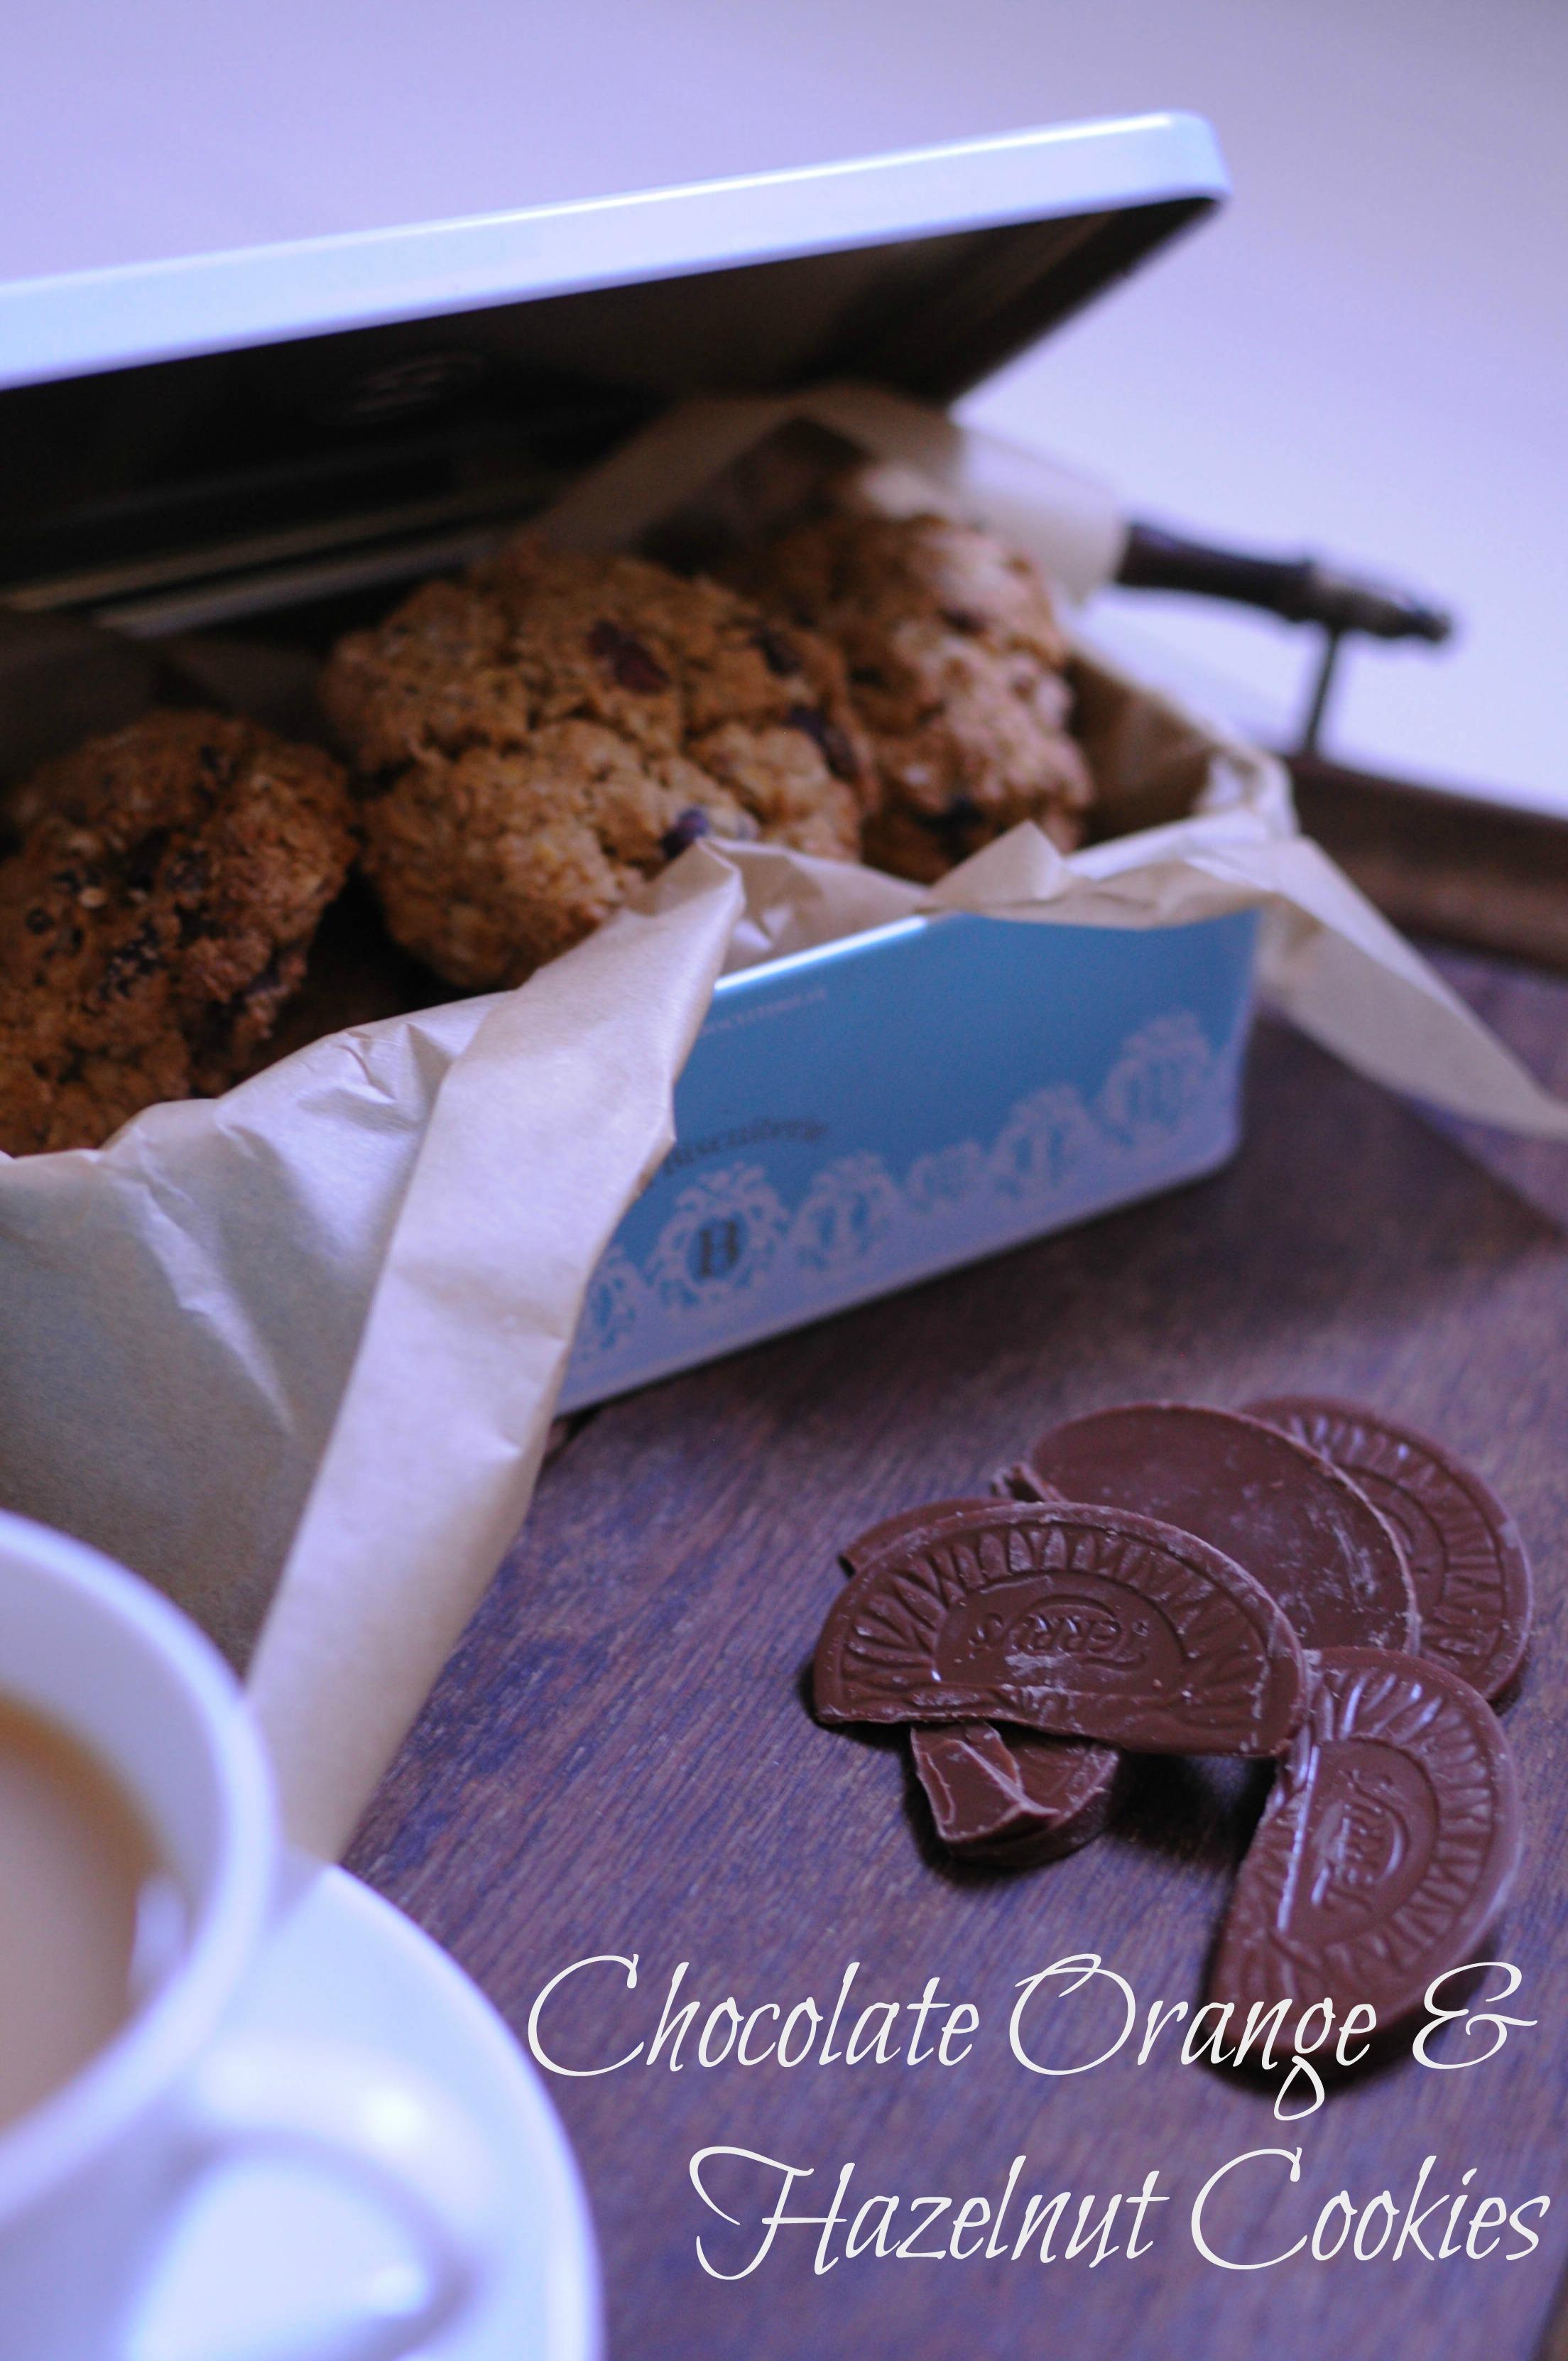 Chocolate Orange & Hazelnut Cookie recipe Via A Playful Day